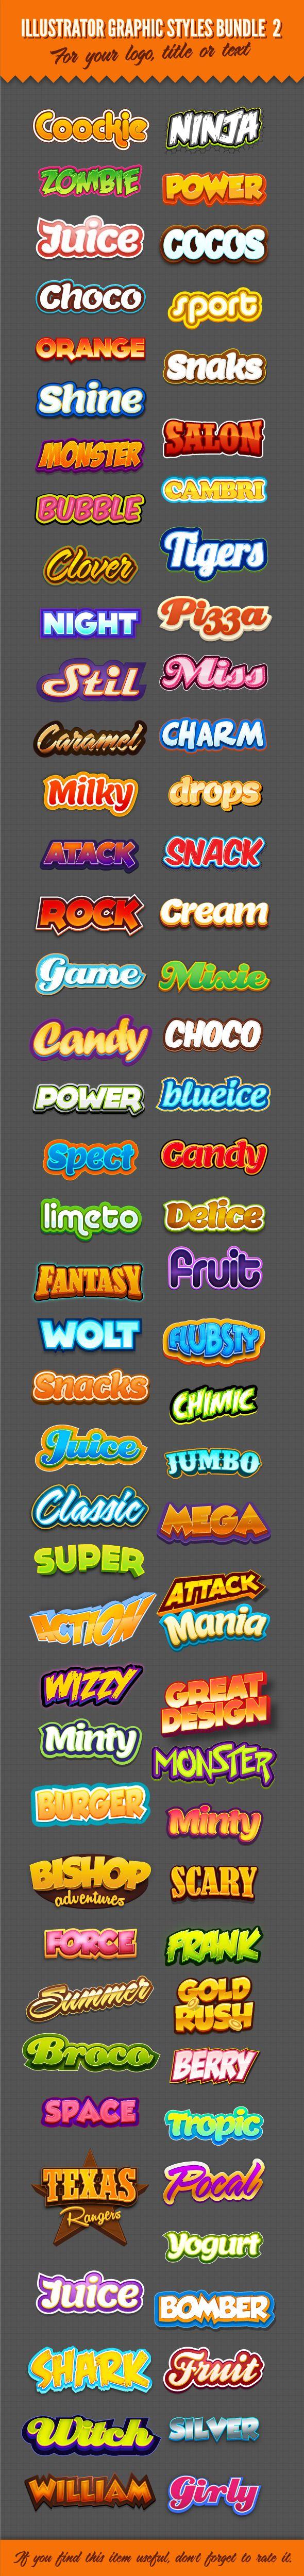 Illustrator Logo Graphic Text Styles Bundle For Adobe Illustrator #design #ai Download: http://graphicriver.net/item/illustrator-logo-graphic-styles-bundle-2/9523253?ref=ksioks